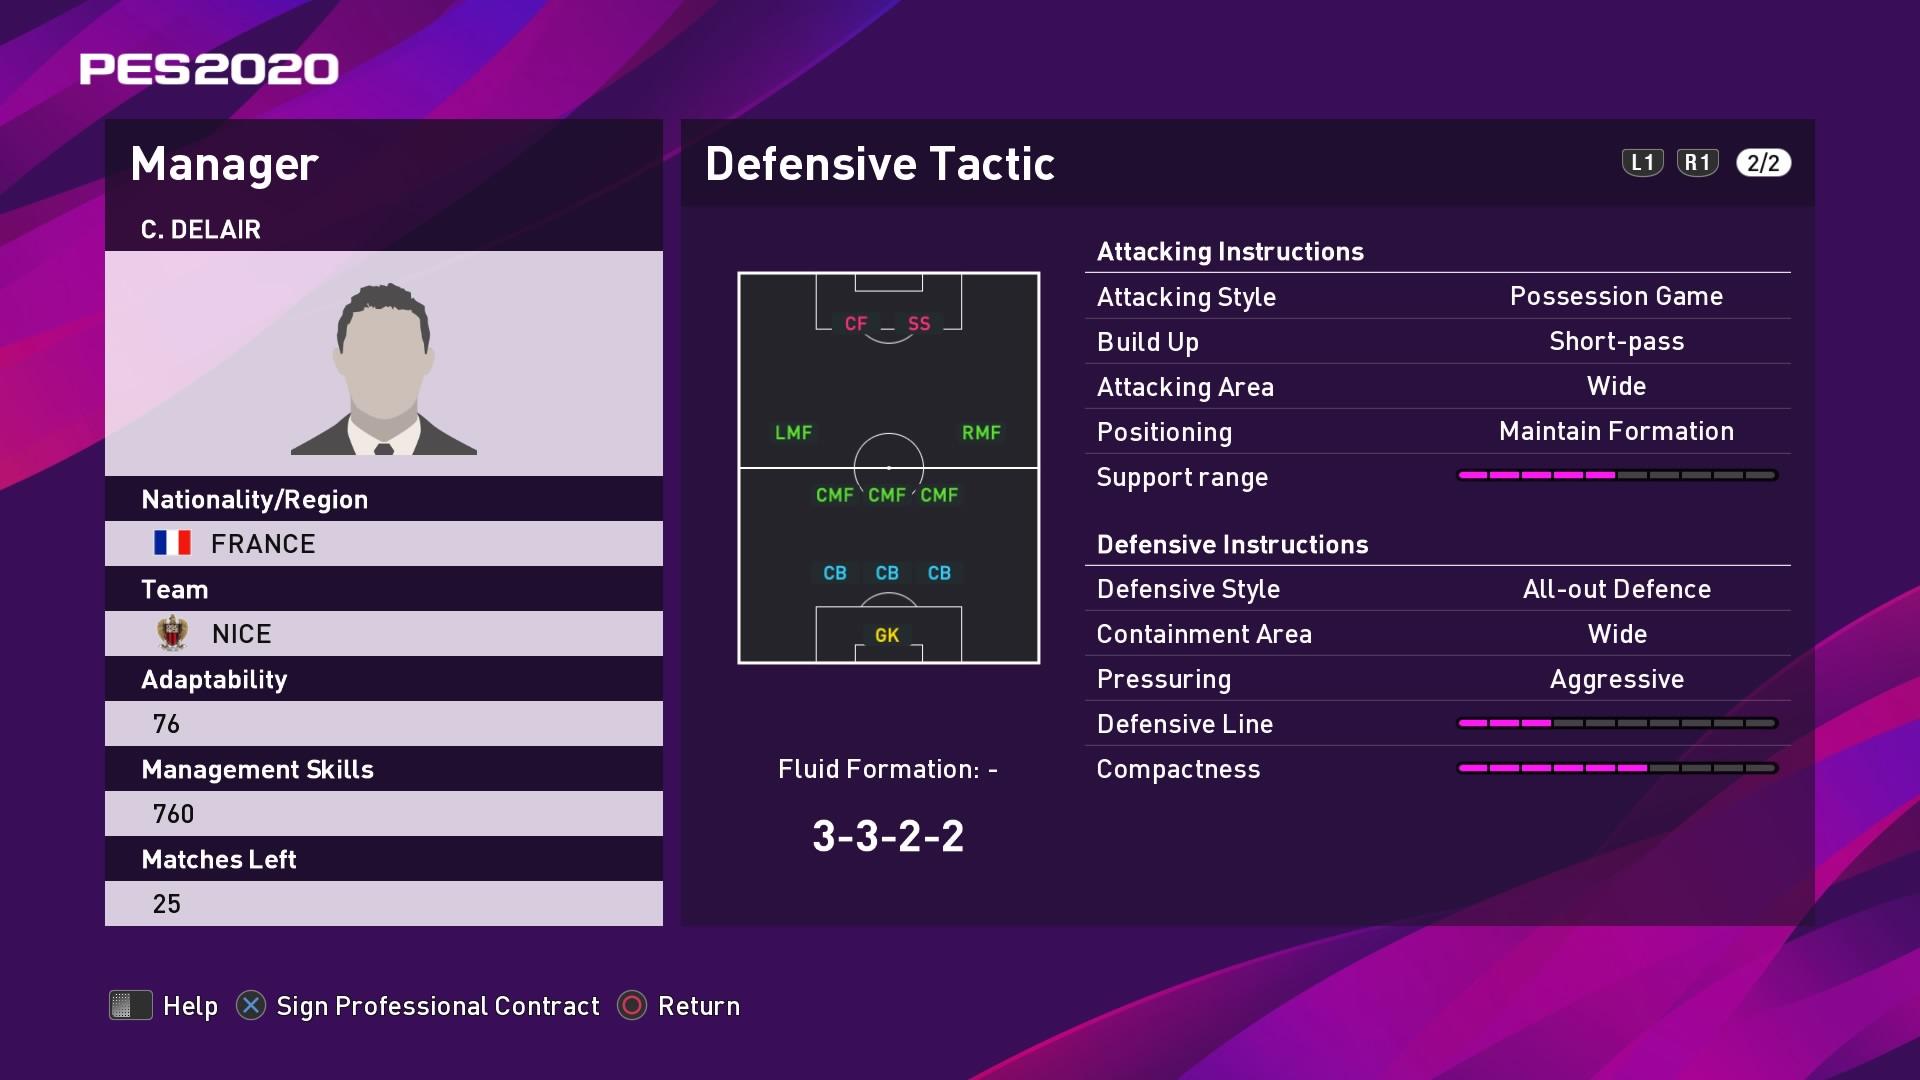 C. Delair (Patrick Vieira) Defensive Tactic in PES 2020 myClub